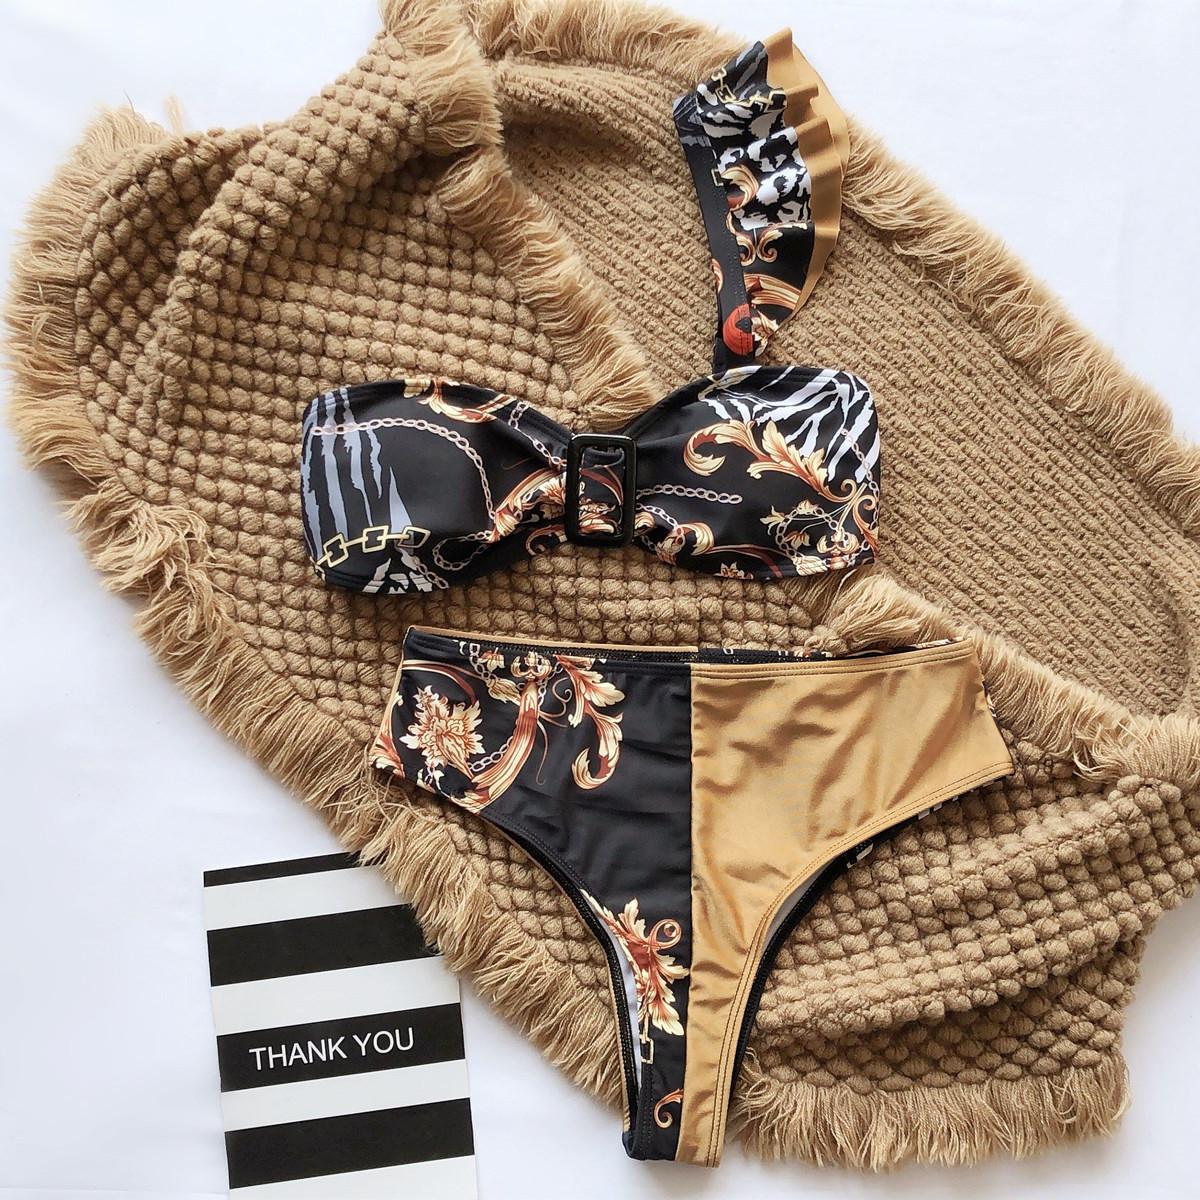 new swimsuit ruffled one-shoulder sexy printed bikini NSDA2189